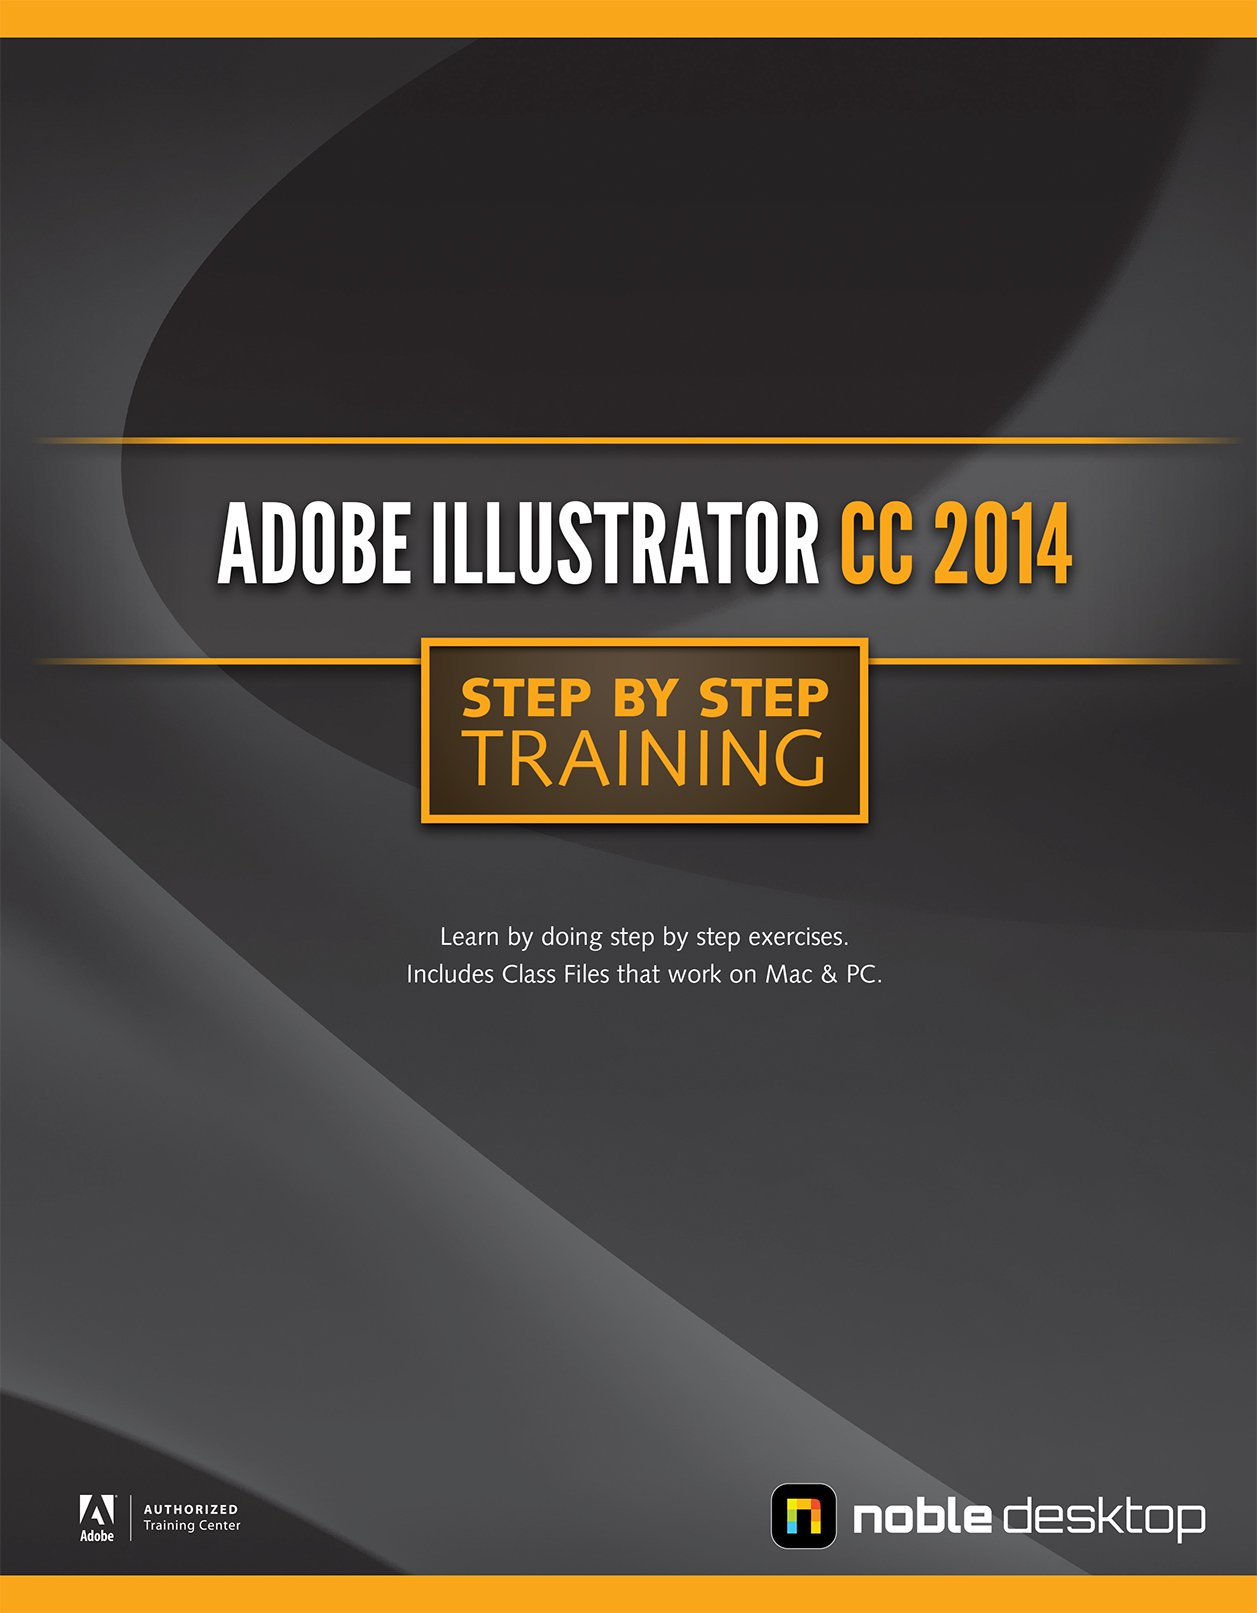 adobe illustrator cc 2014 mac